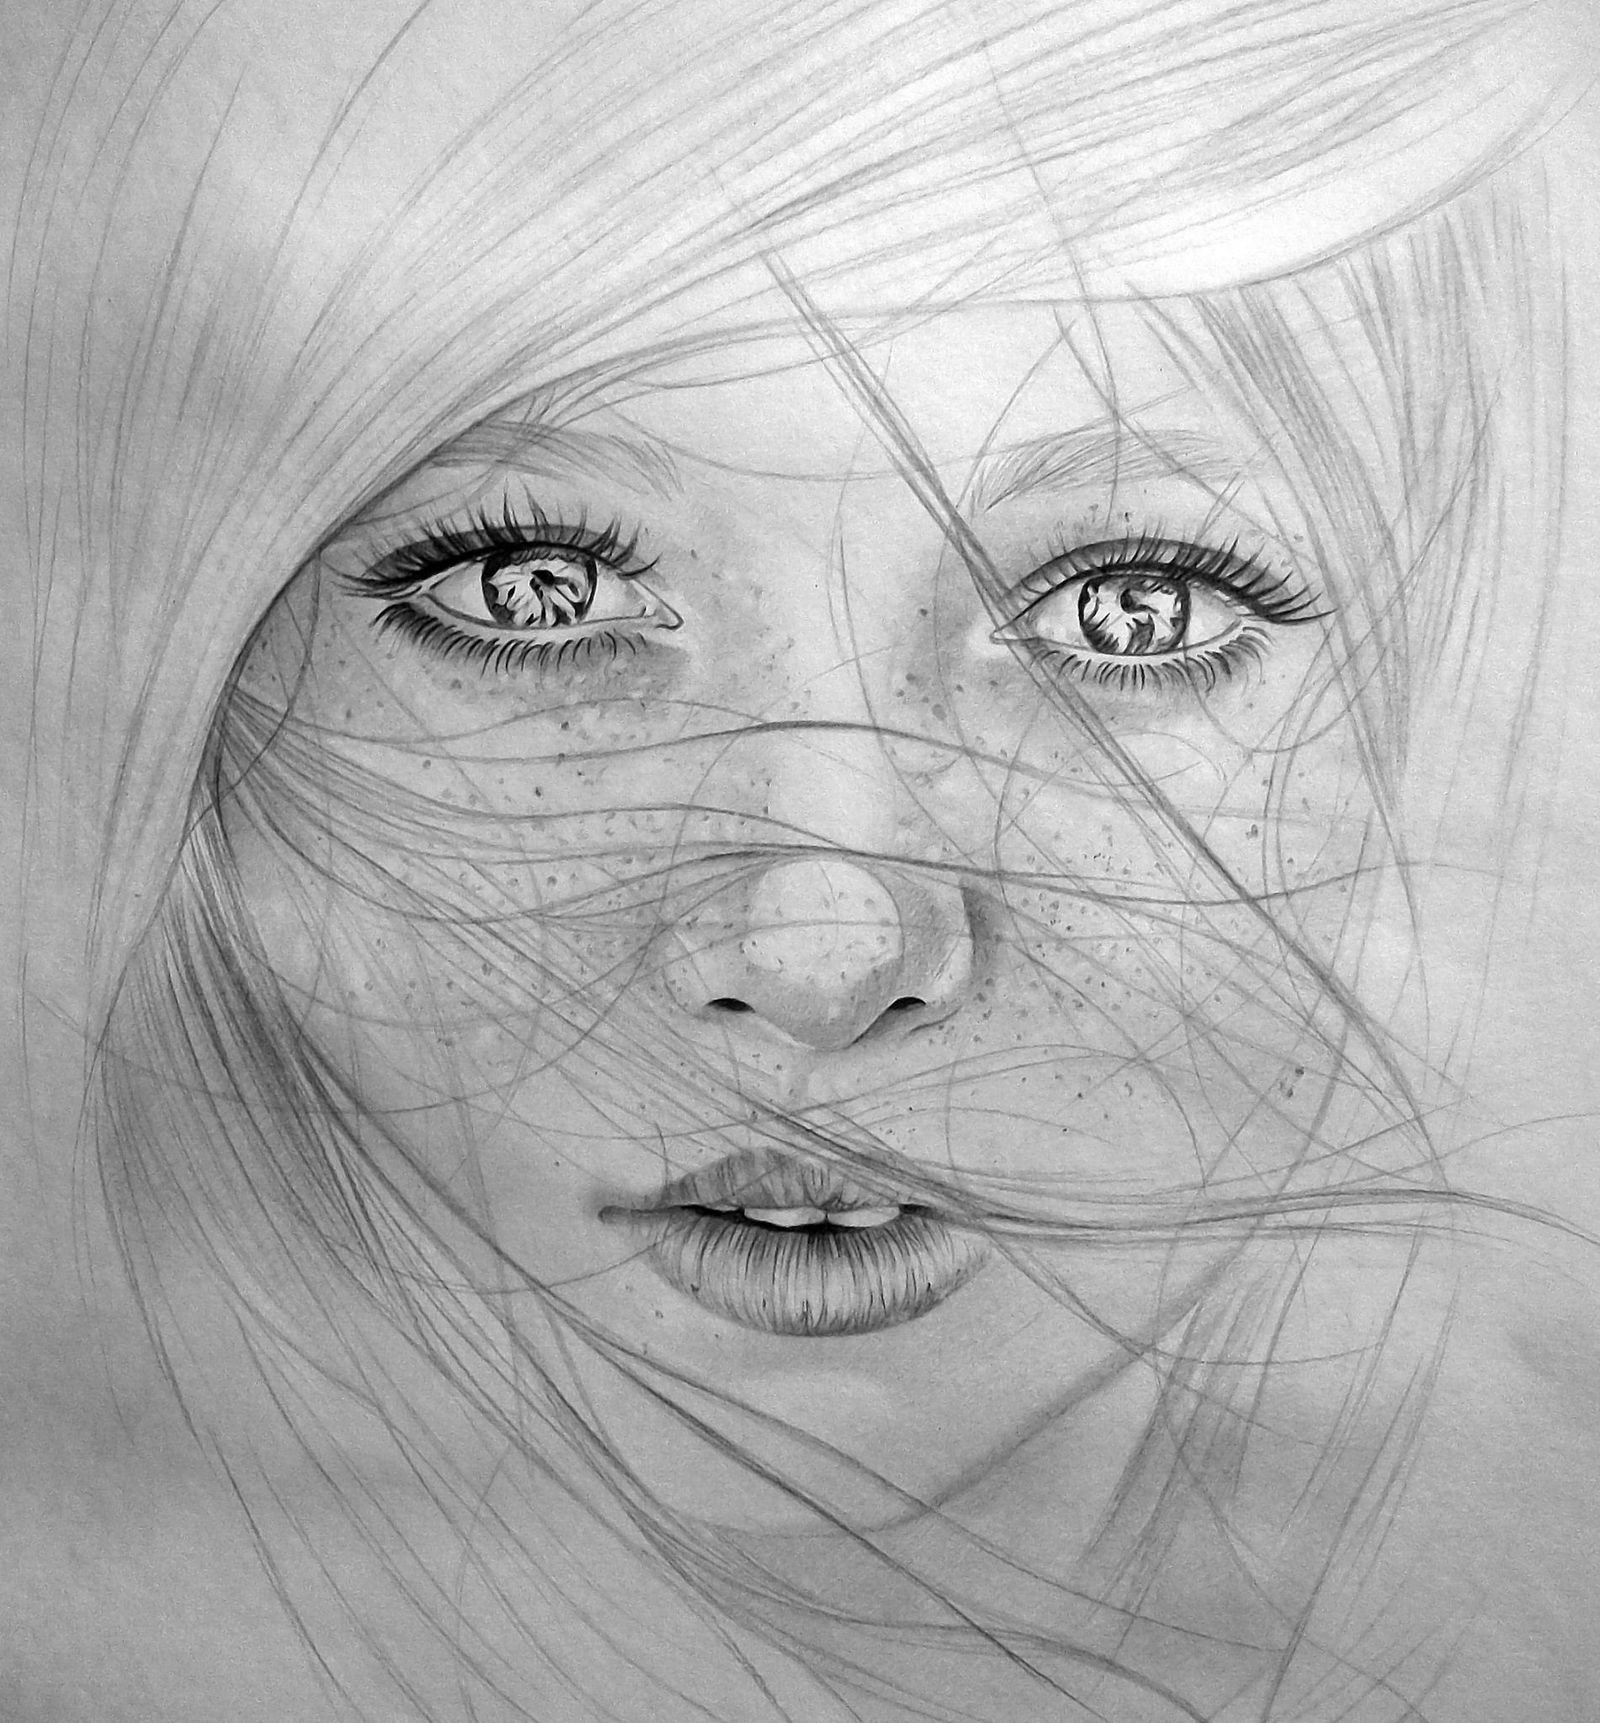 рисуем красивые рисунки карандашом